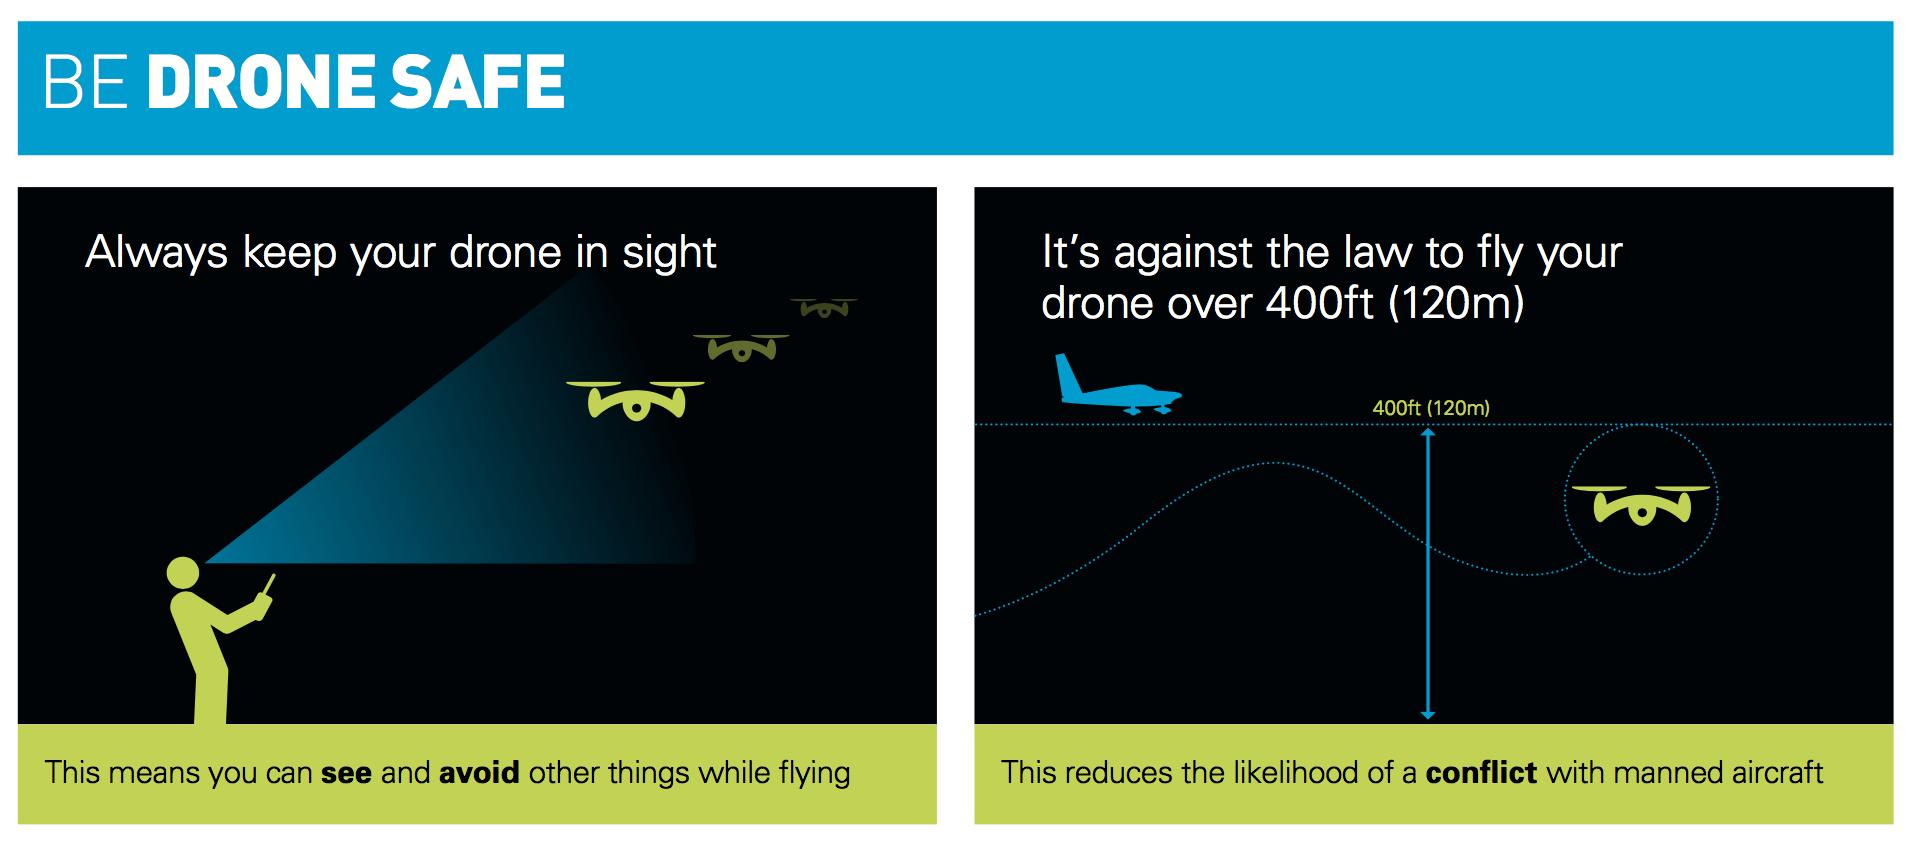 uk-dronecode2-dronesafe.png